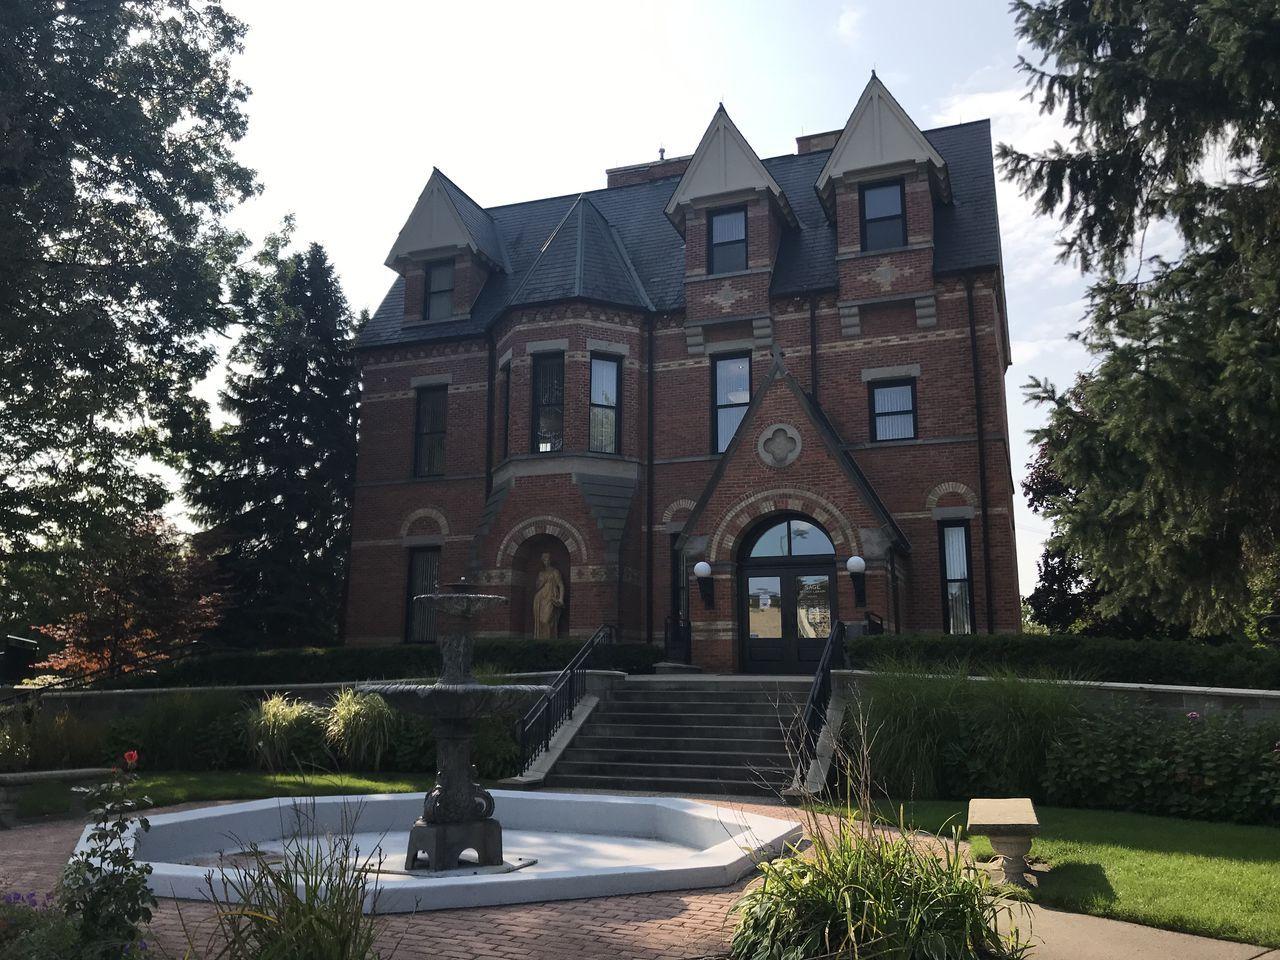 Sage Branch Library Bay City Michigan Bay County Bay City County Library